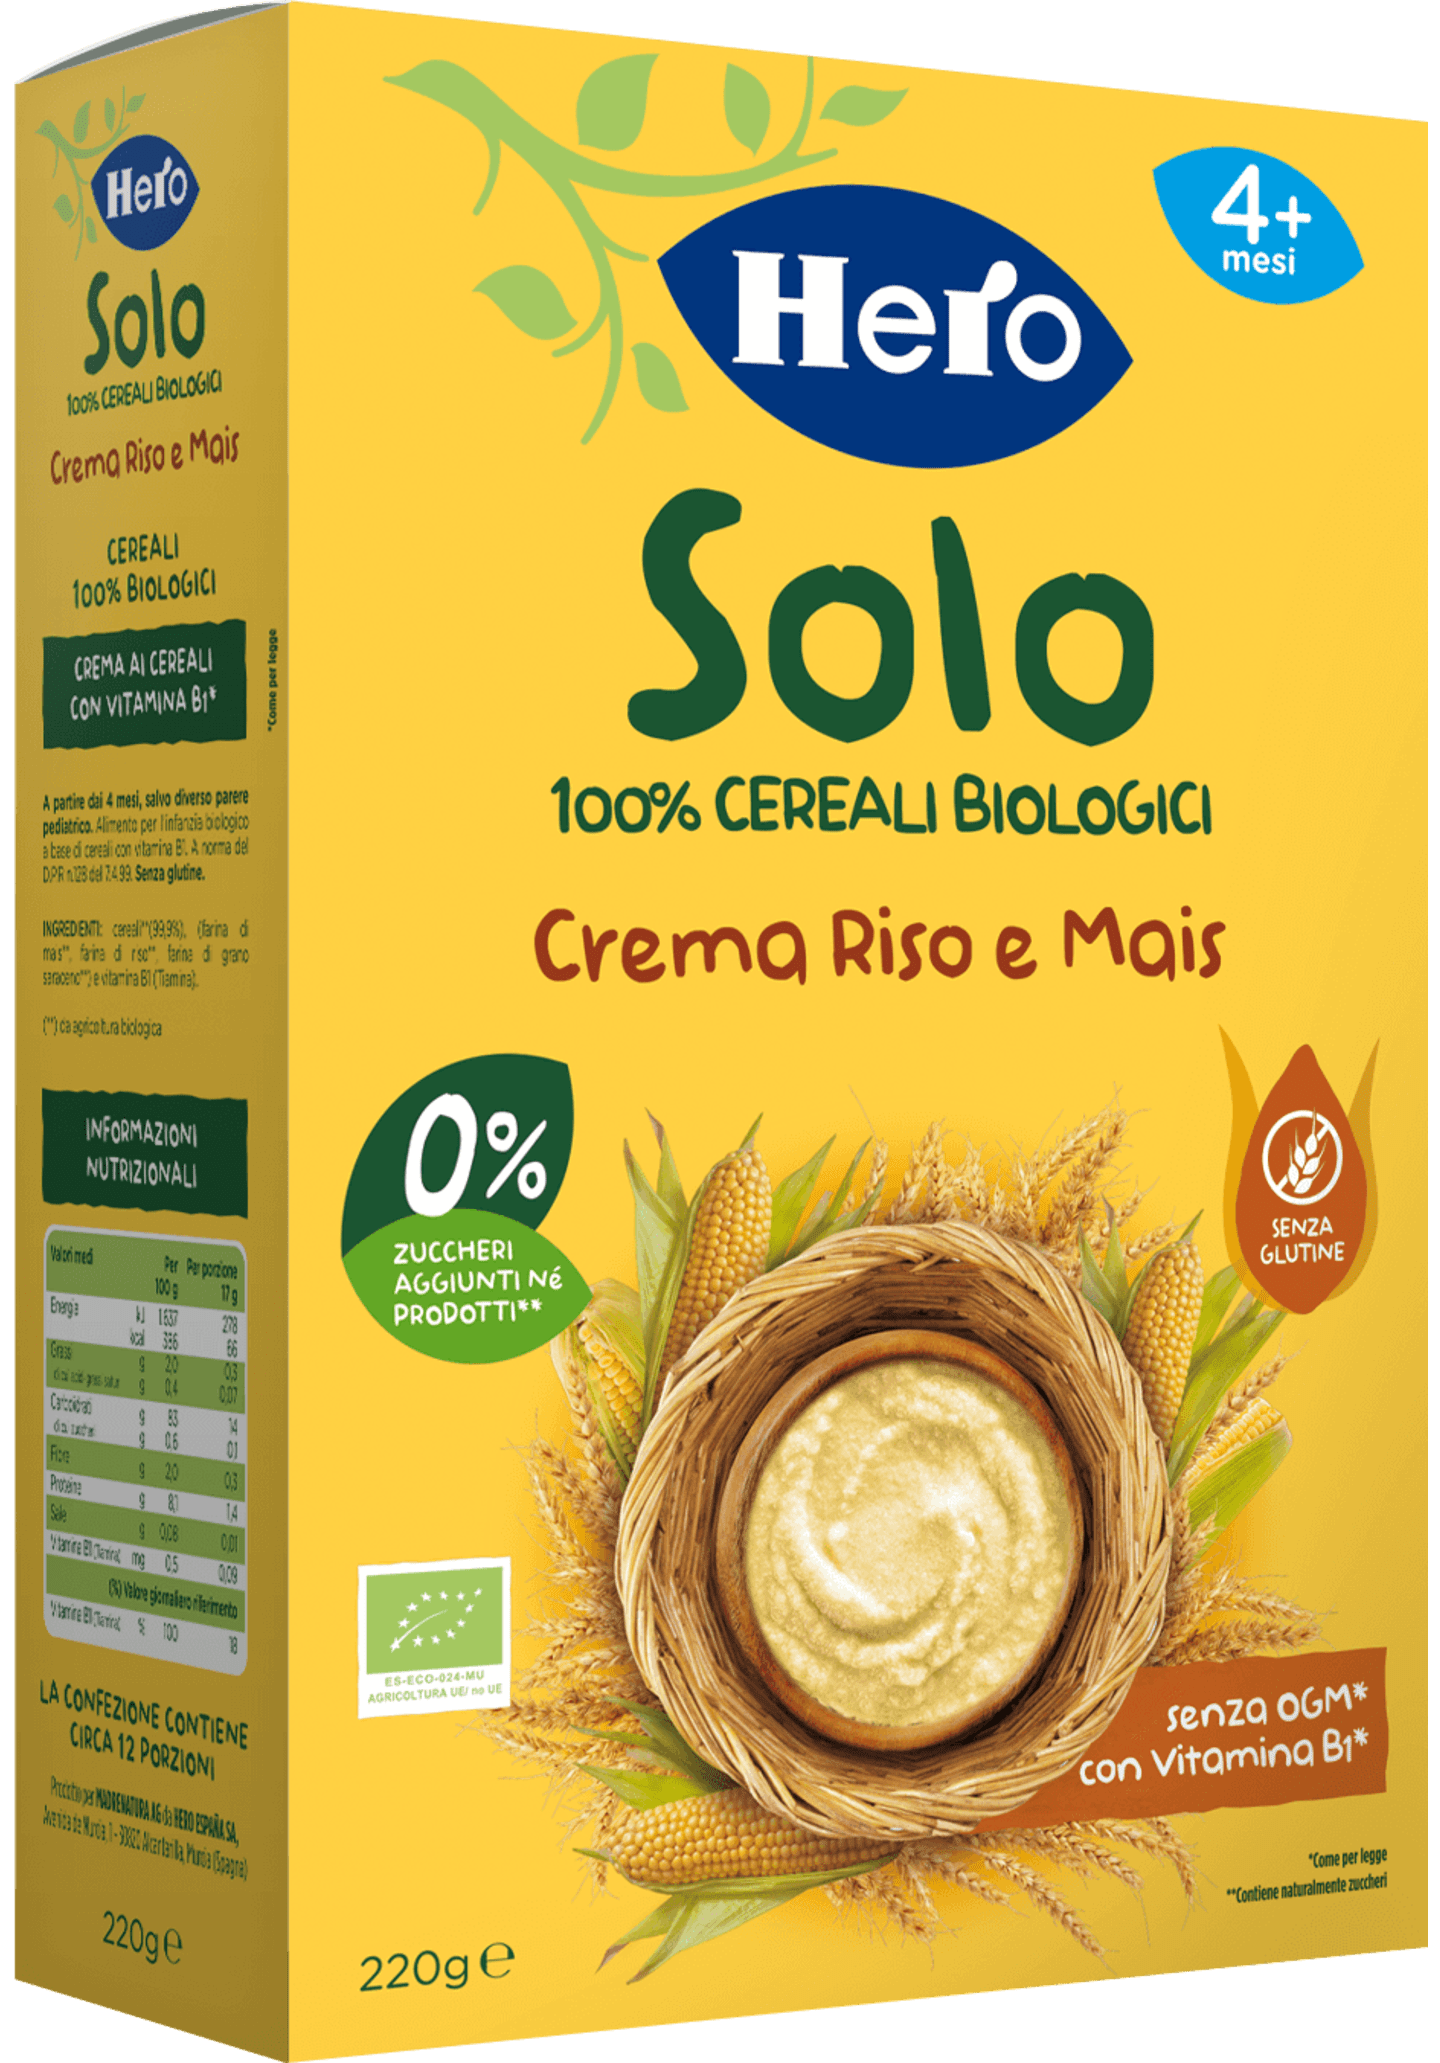 Crema Riso e Mais biologica